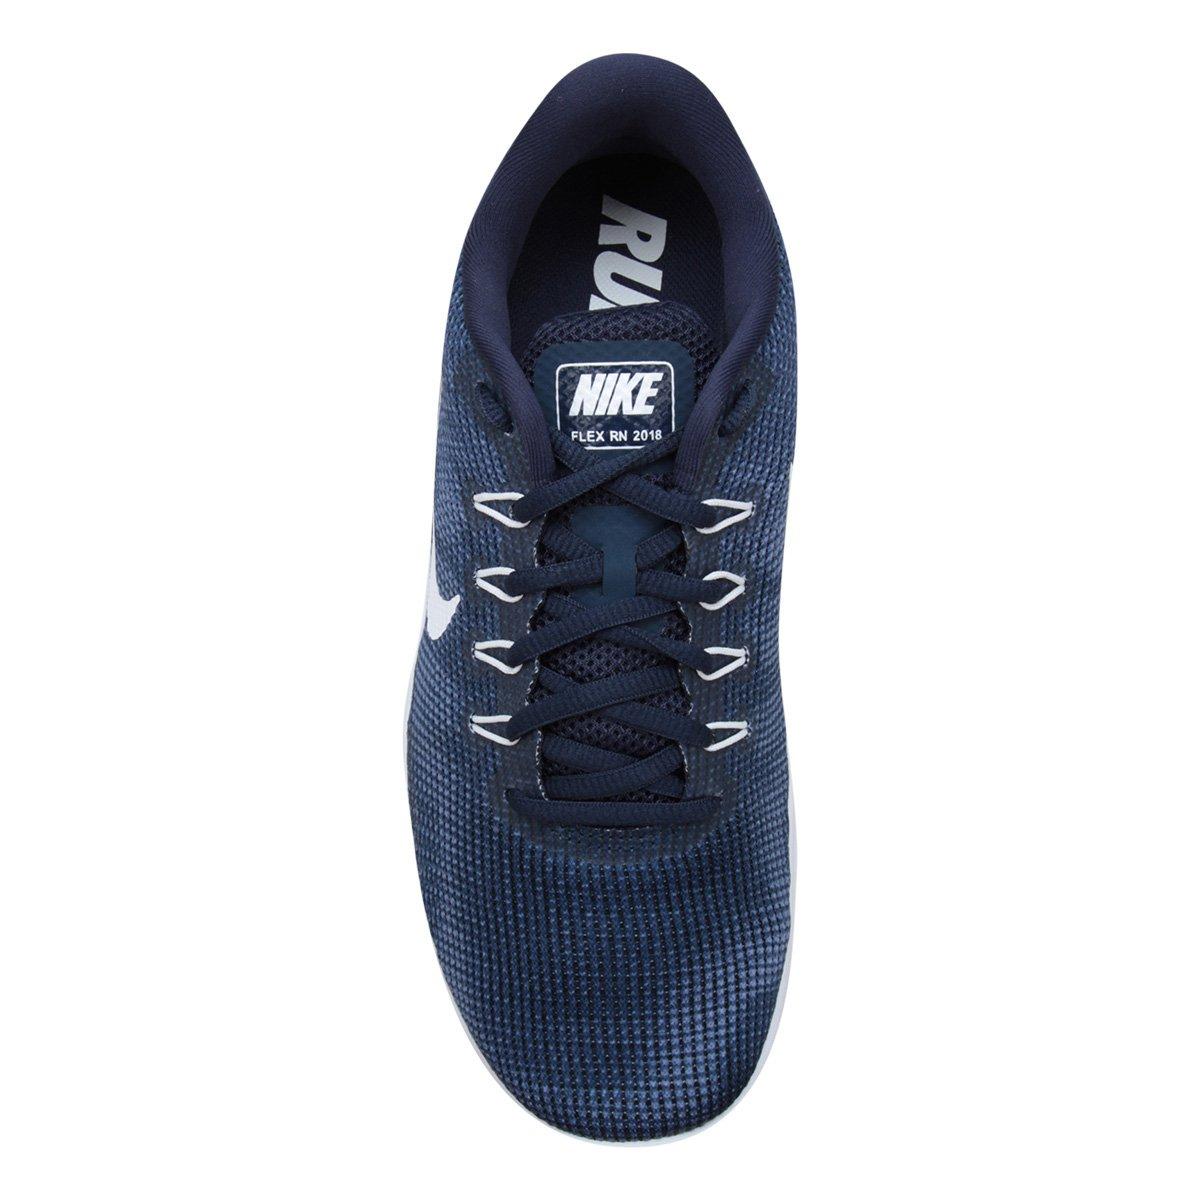 b52a2bb8c6 ... Masculino Rn Flex Azul Nike Tênis Branco e Tênis 2018 Nike 6RBq41gYwO  ...